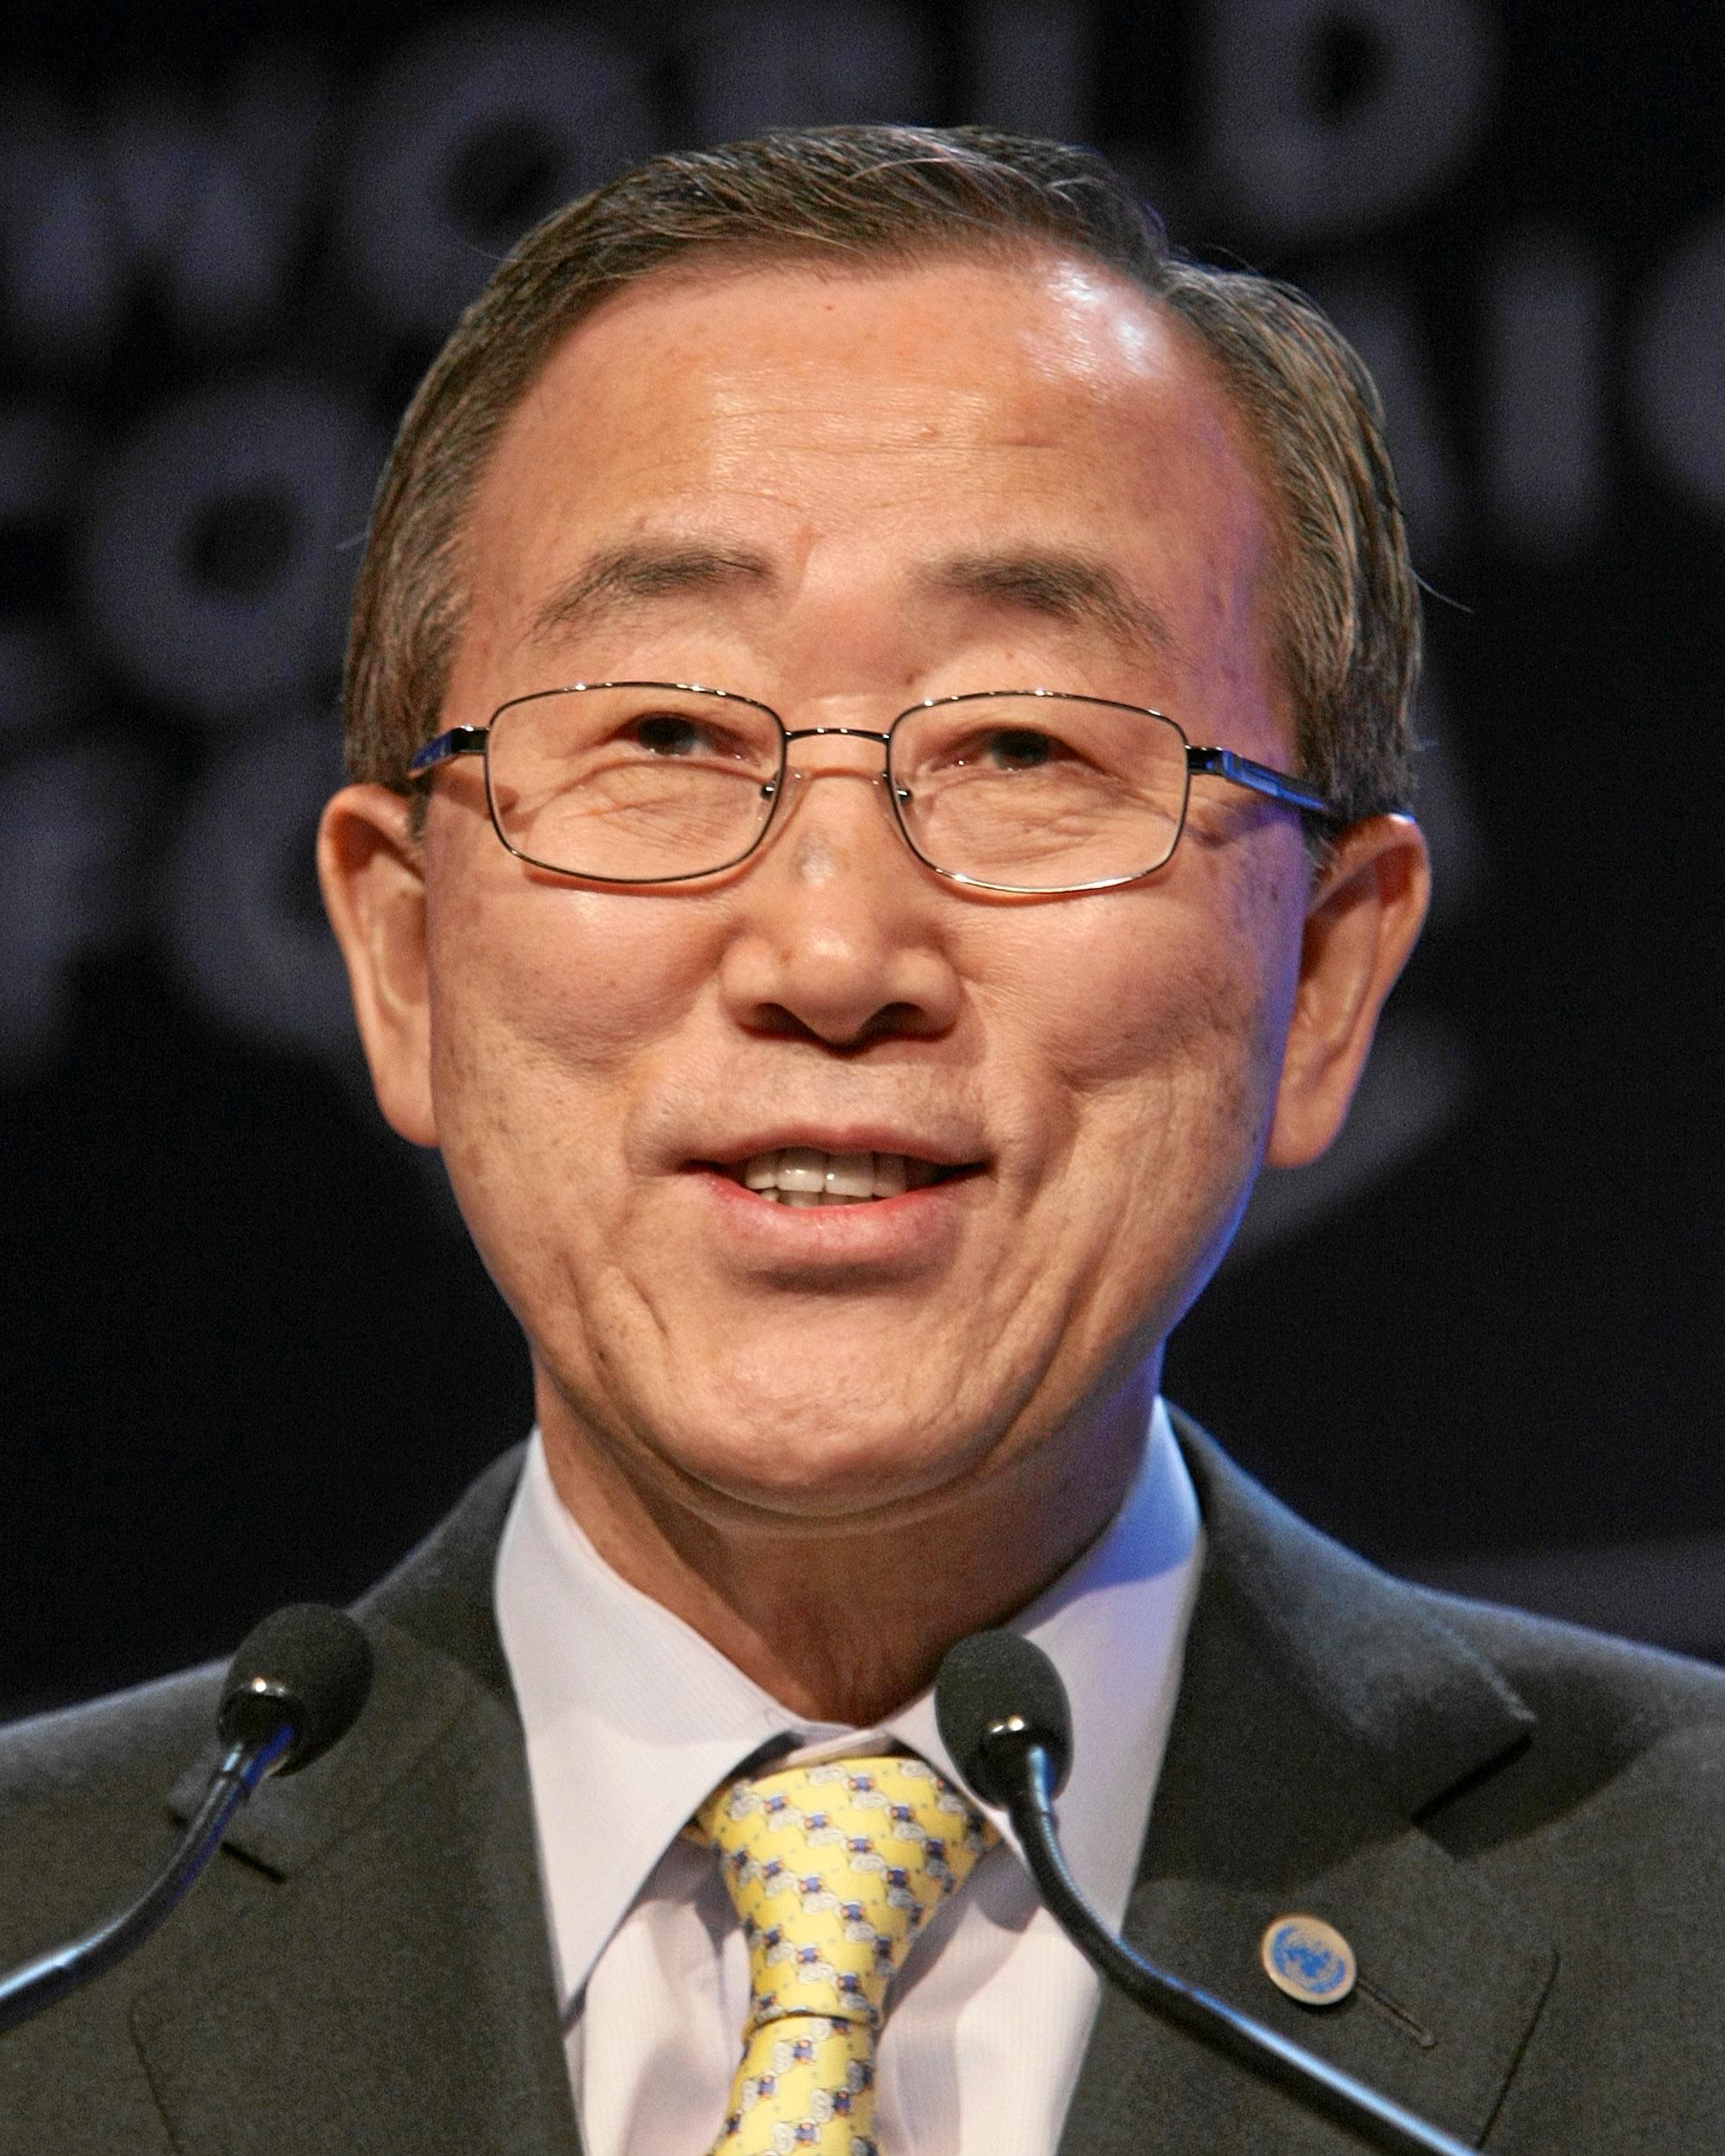 File:Ban Ki-moon 1-2.jpg - Wikimedia Commons